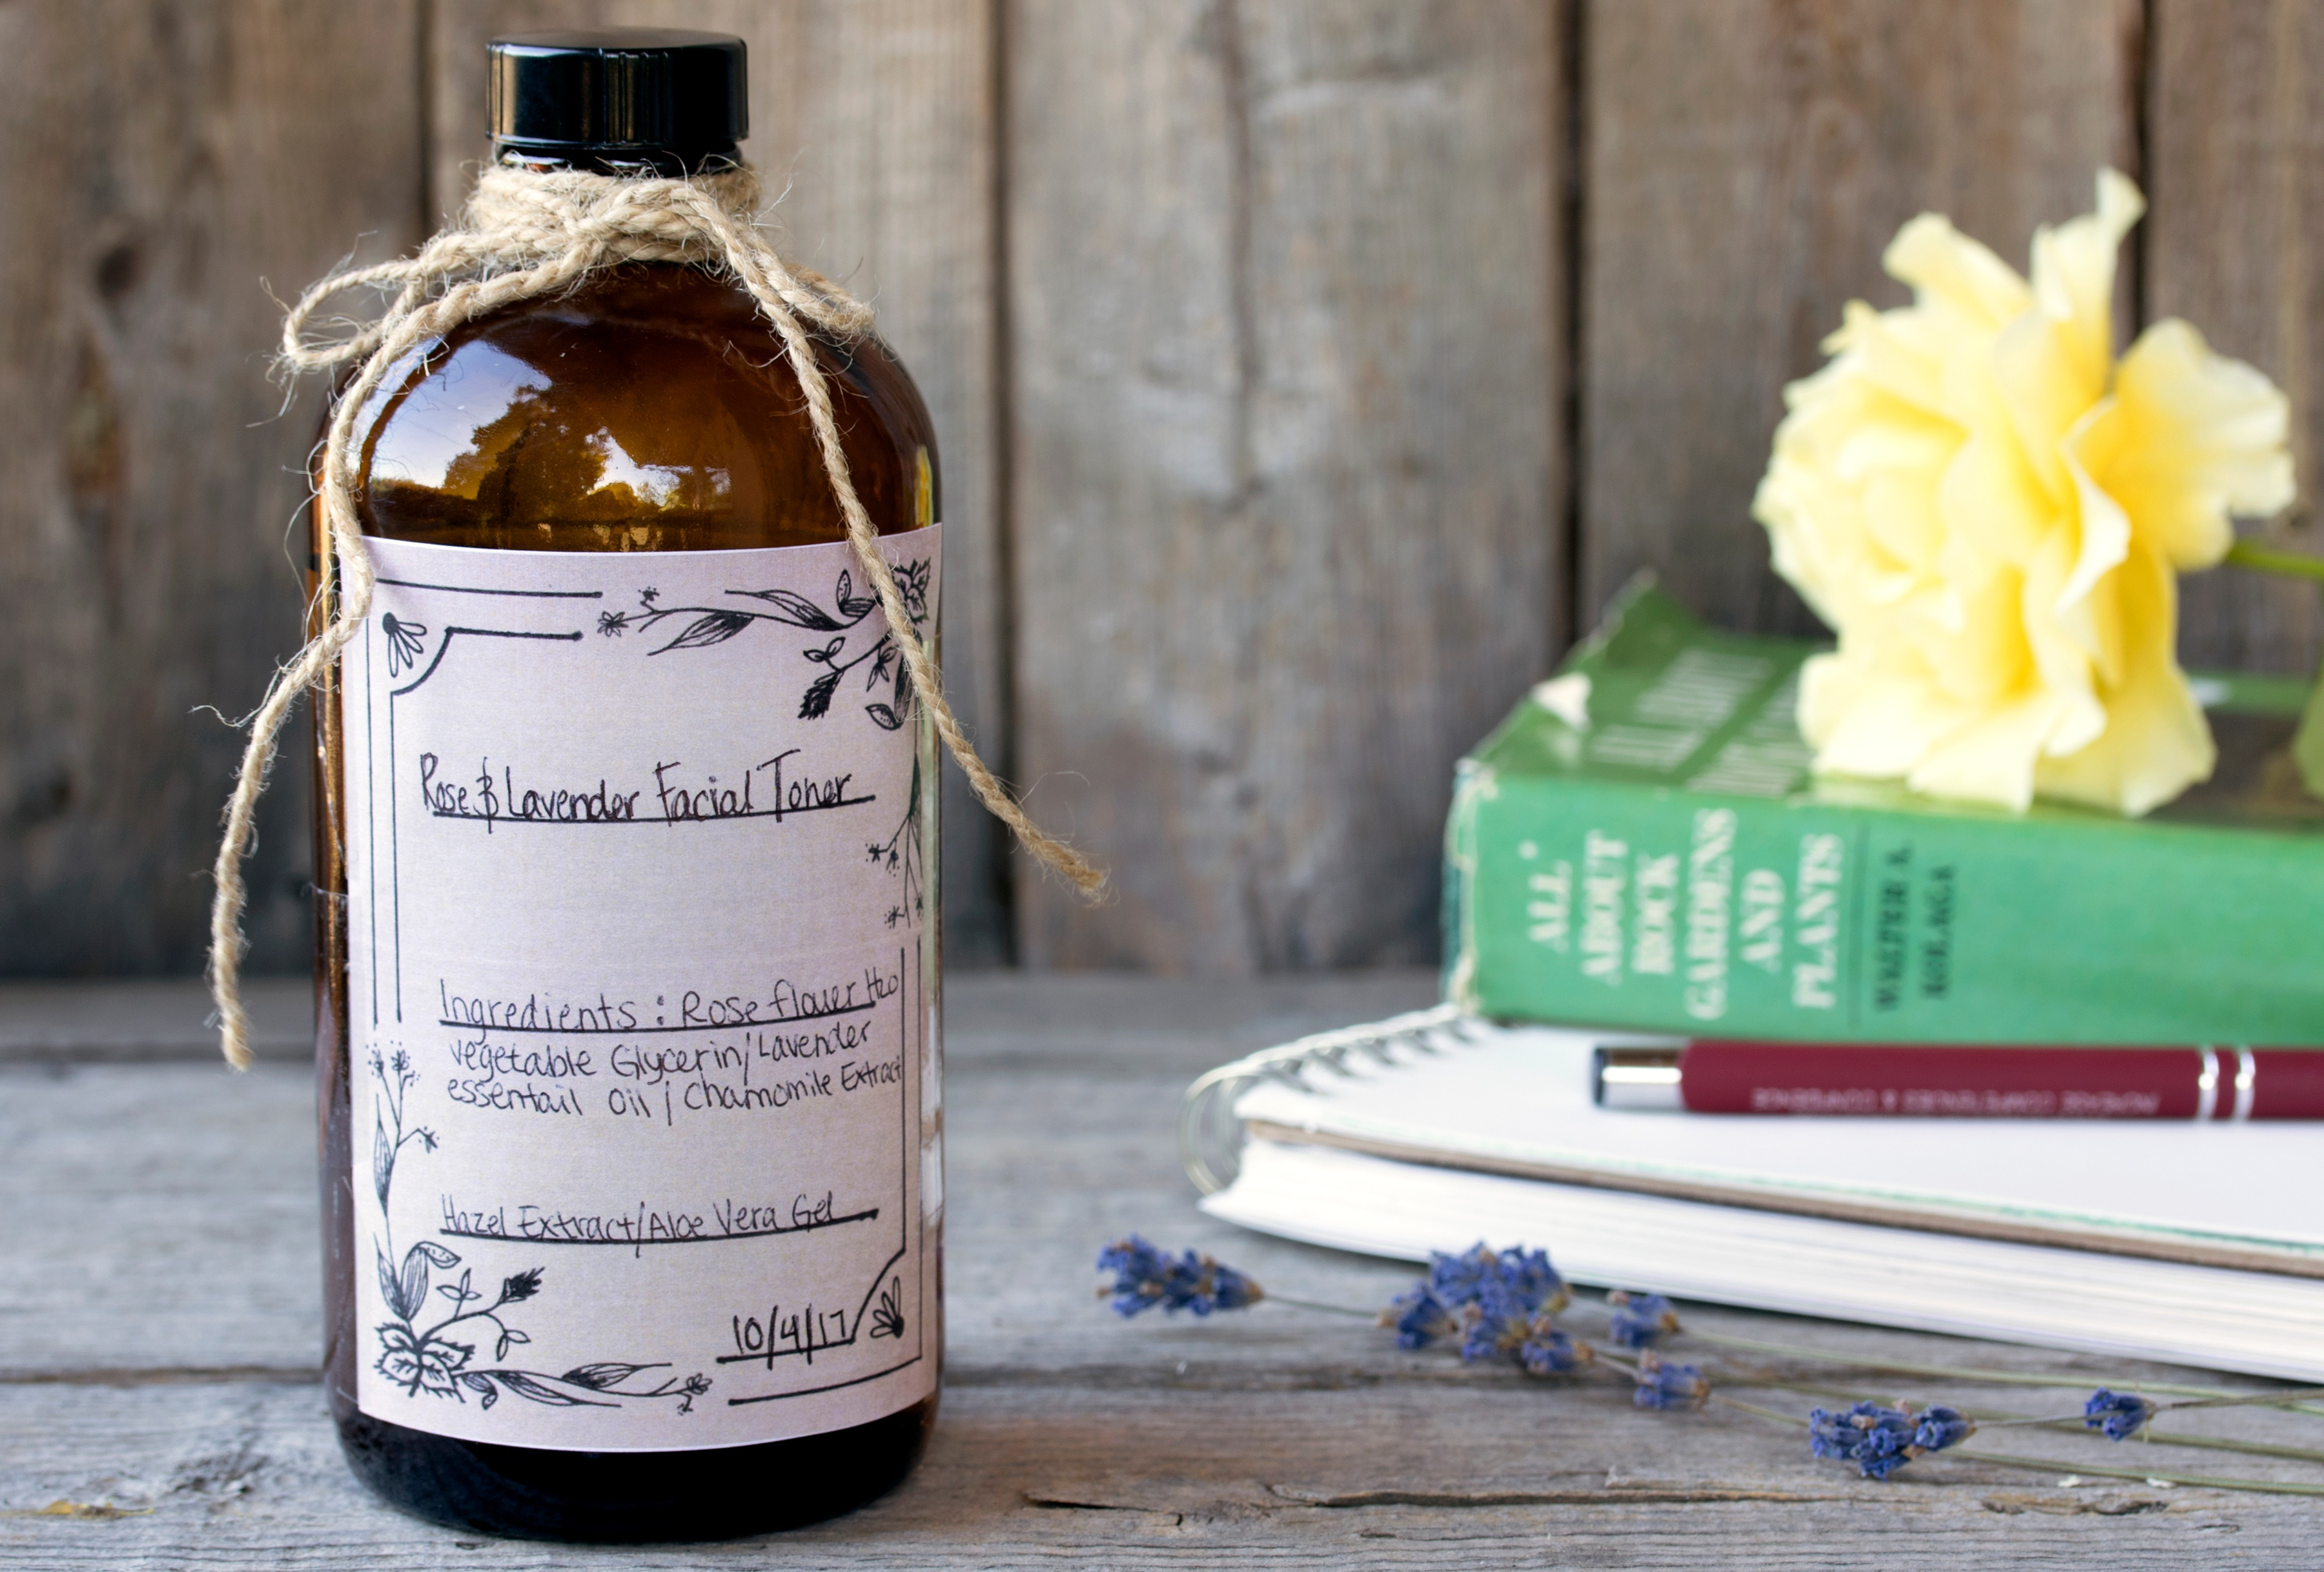 Handmade label on bottle of Rose and Lavender Facial Toner